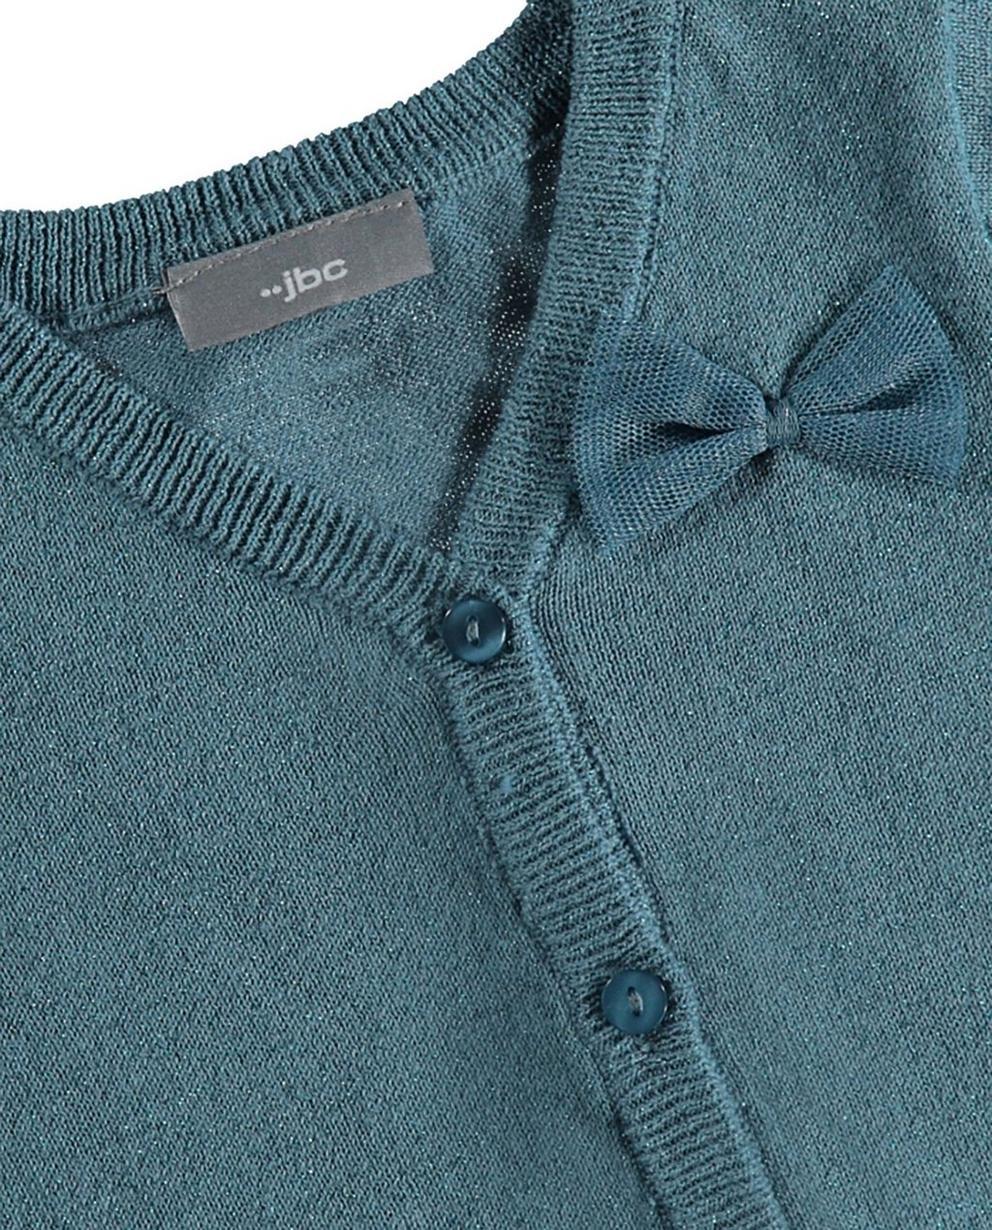 Strickjacken - Aqua - Jacke mit Metallfaden